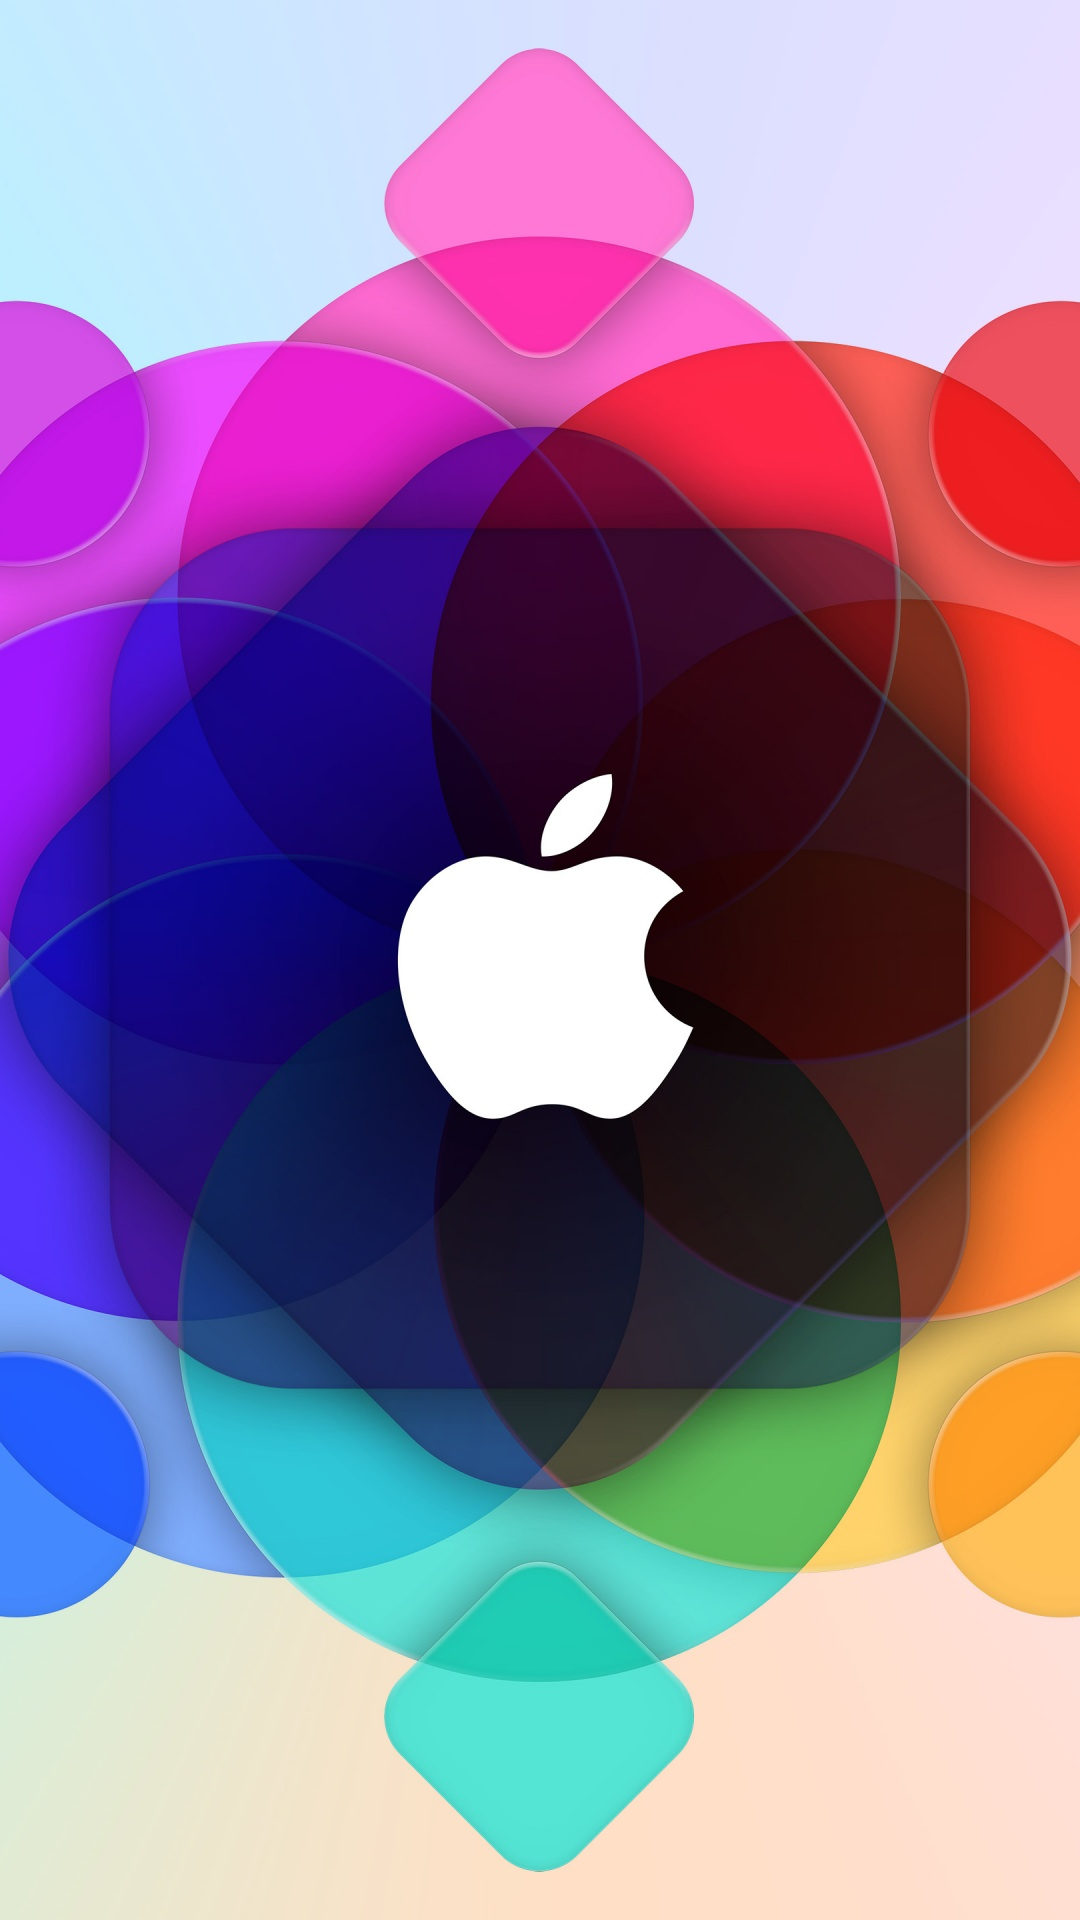 Apple Logo 4k Wallpaper Wwdc Colorful Gradient Background 5k Technology 1565